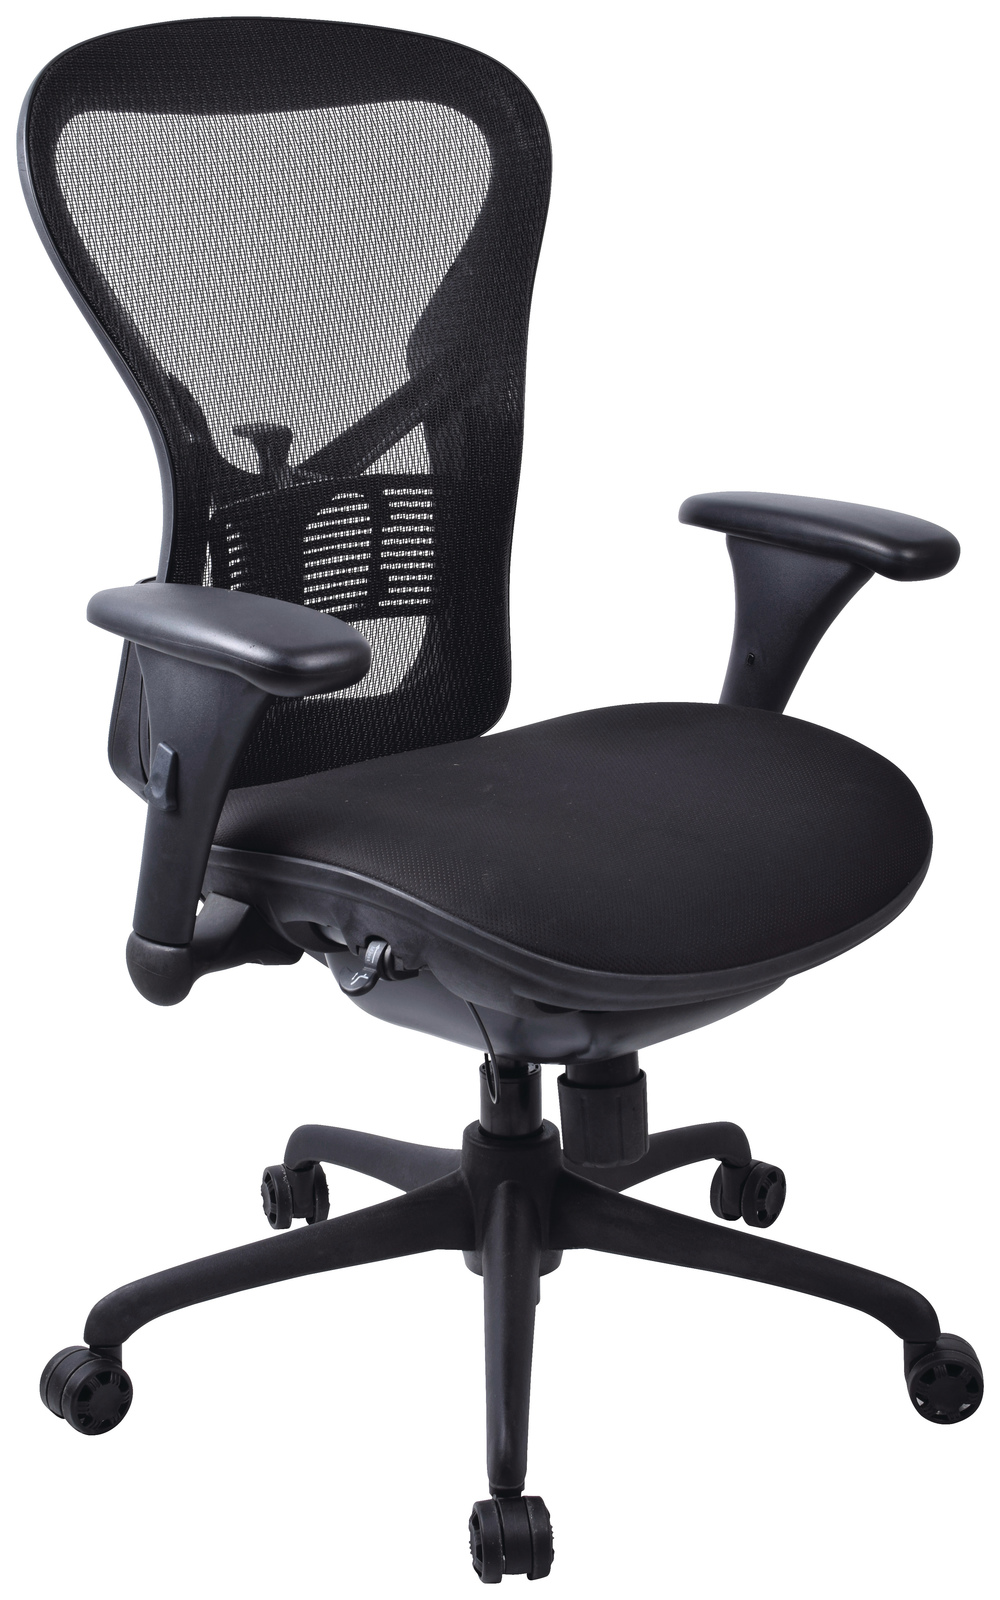 Croxley Workpro Operator Slide Mesh Back Chair (Black) image